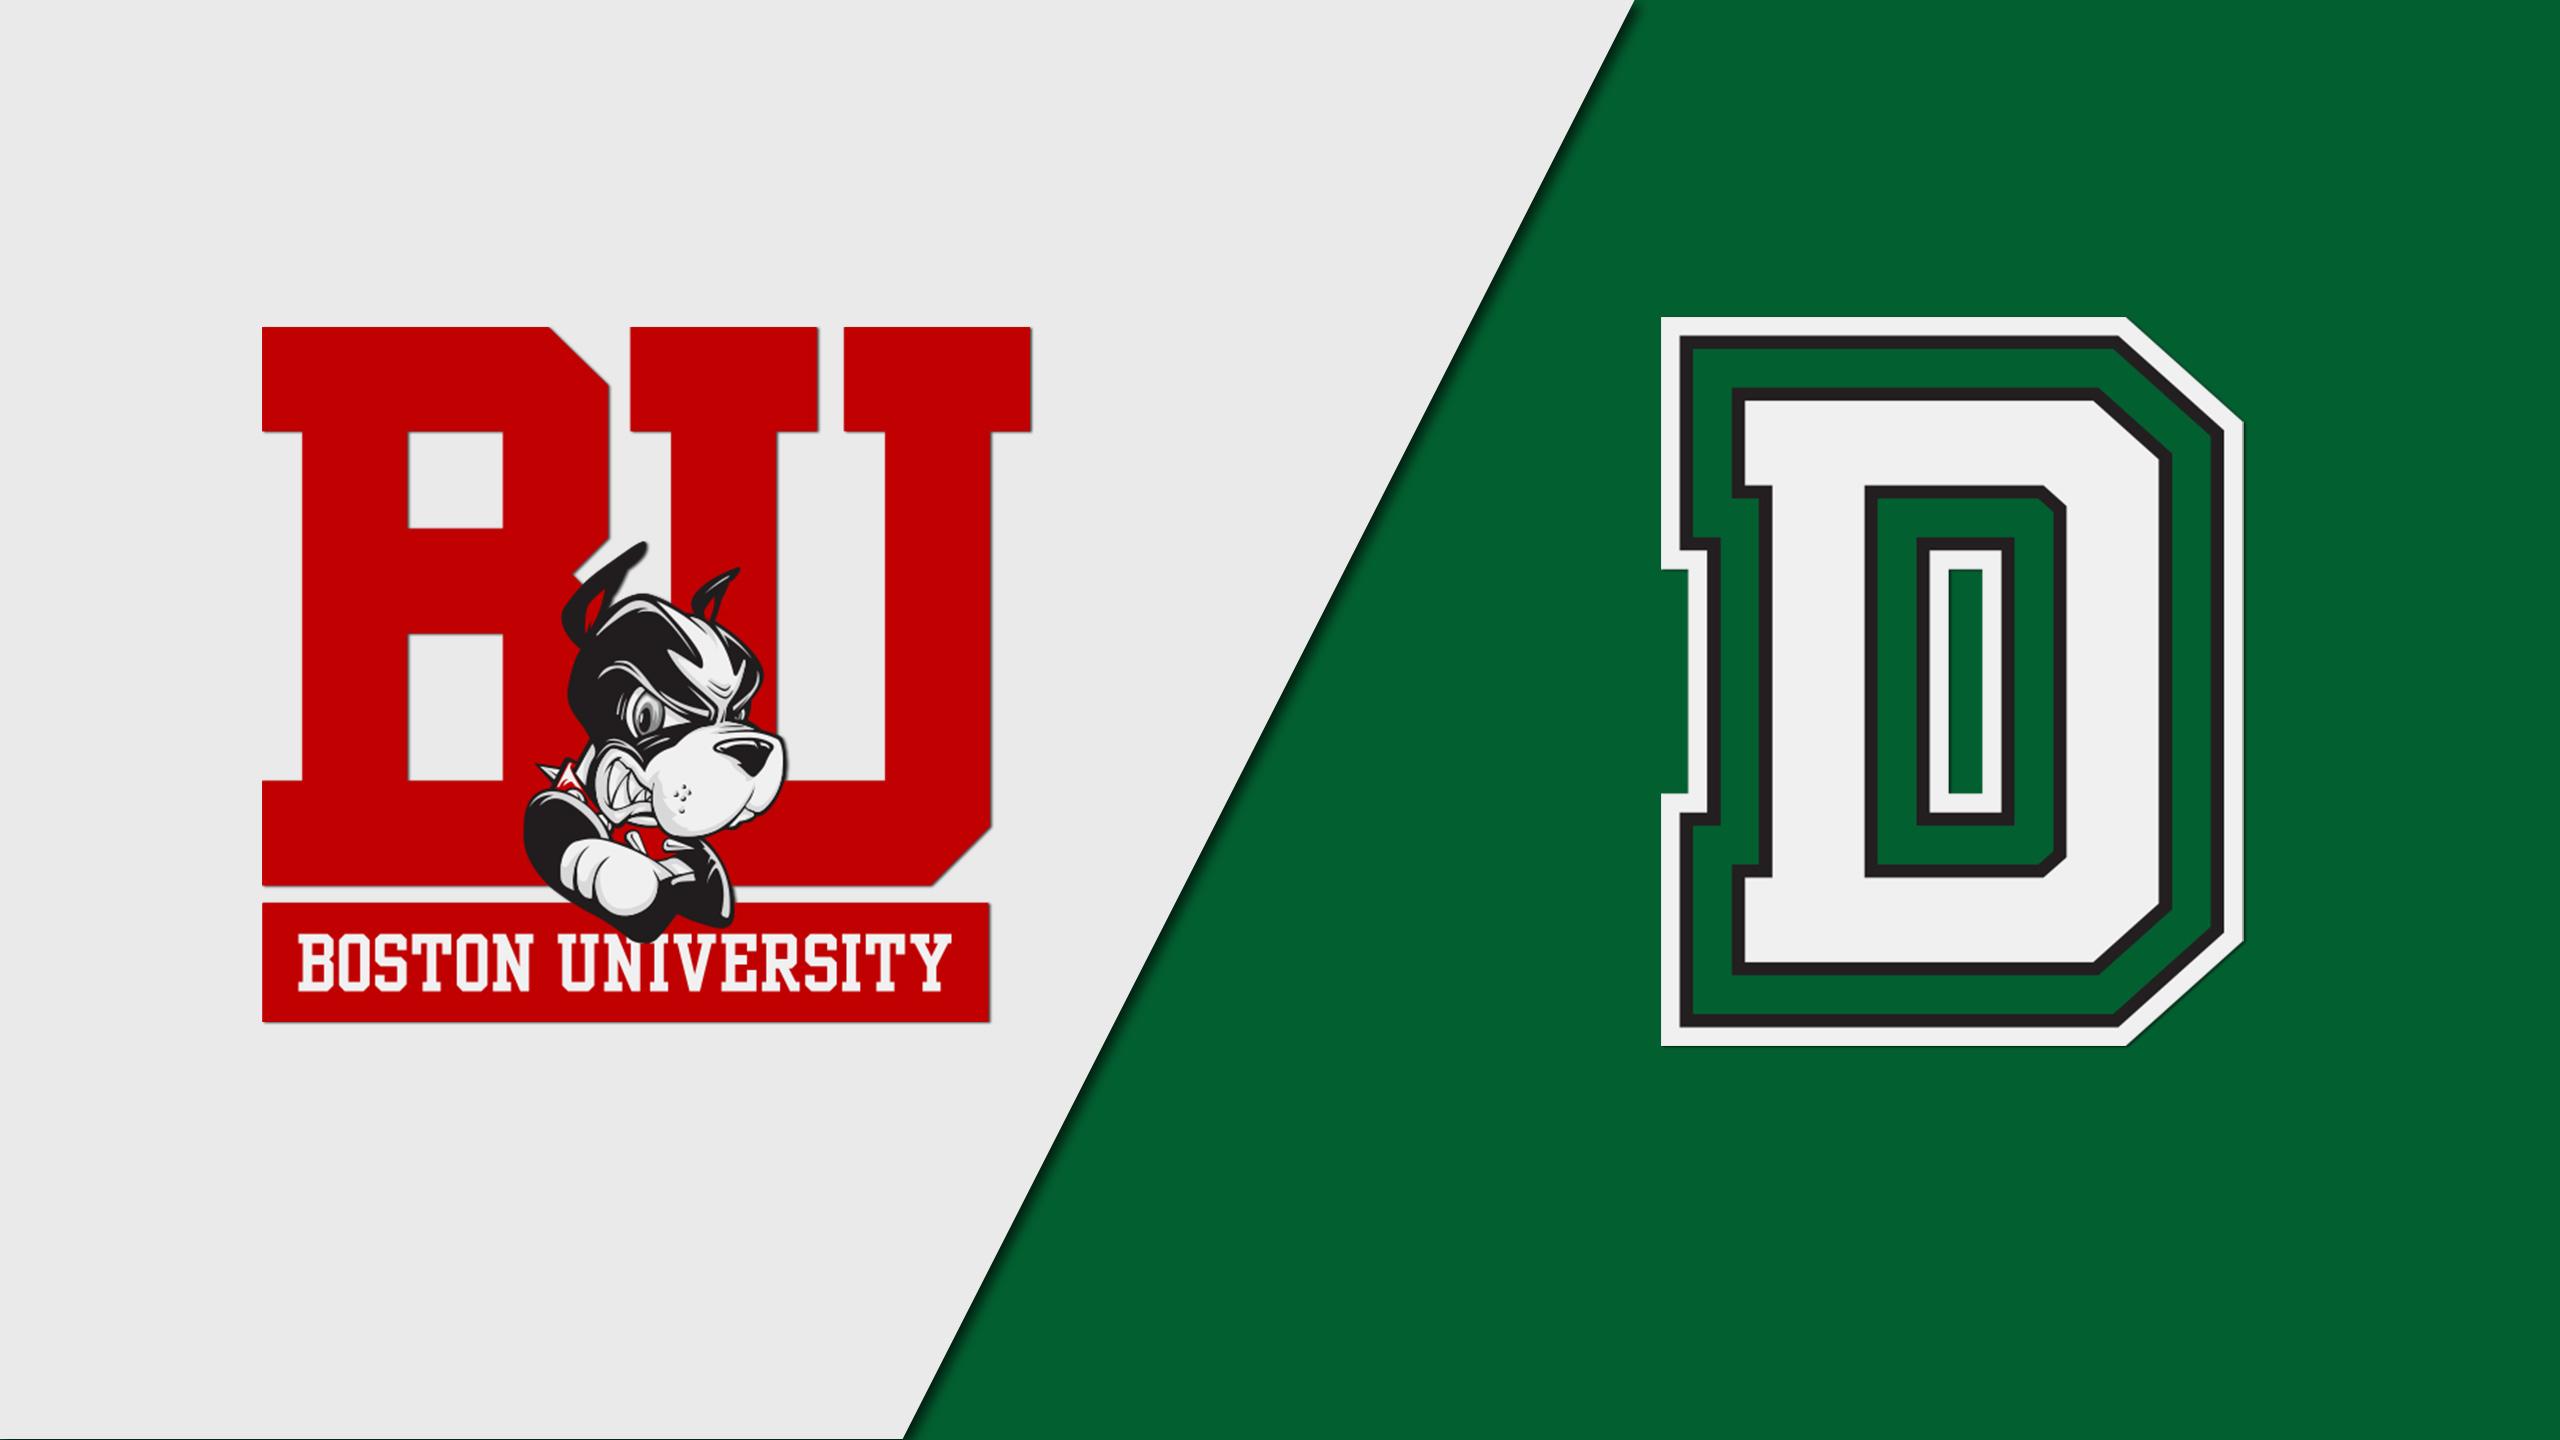 Boston University vs. Dartmouth (Court 4)